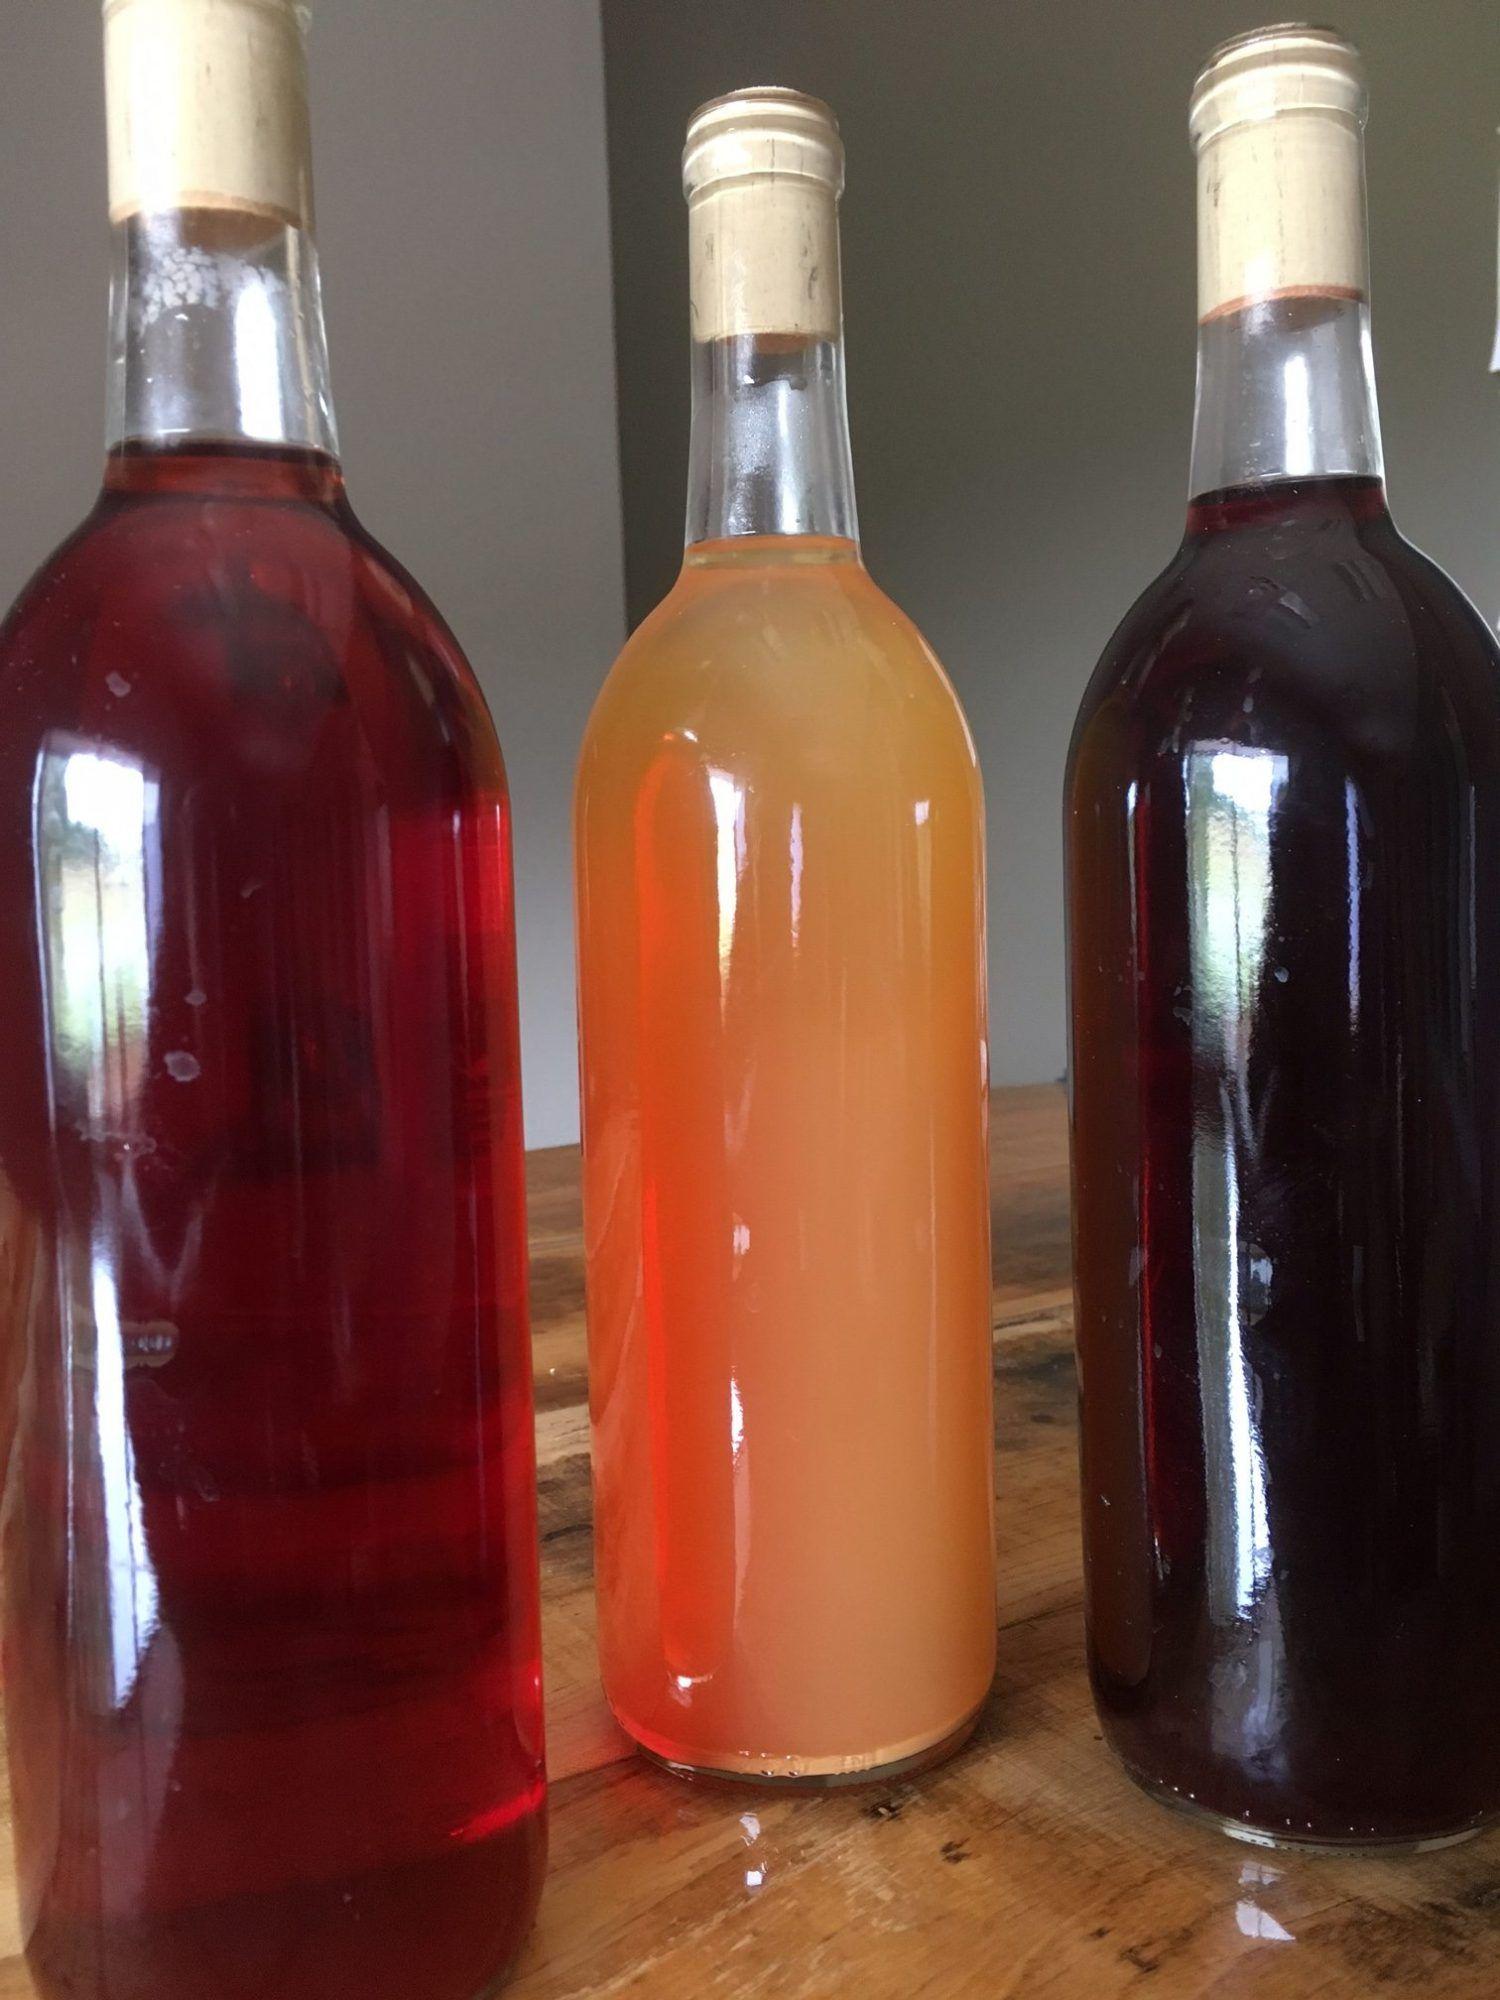 Botanist Barrell Hillsborough Wine And Cider Botanist Barrel Bottles Decoration